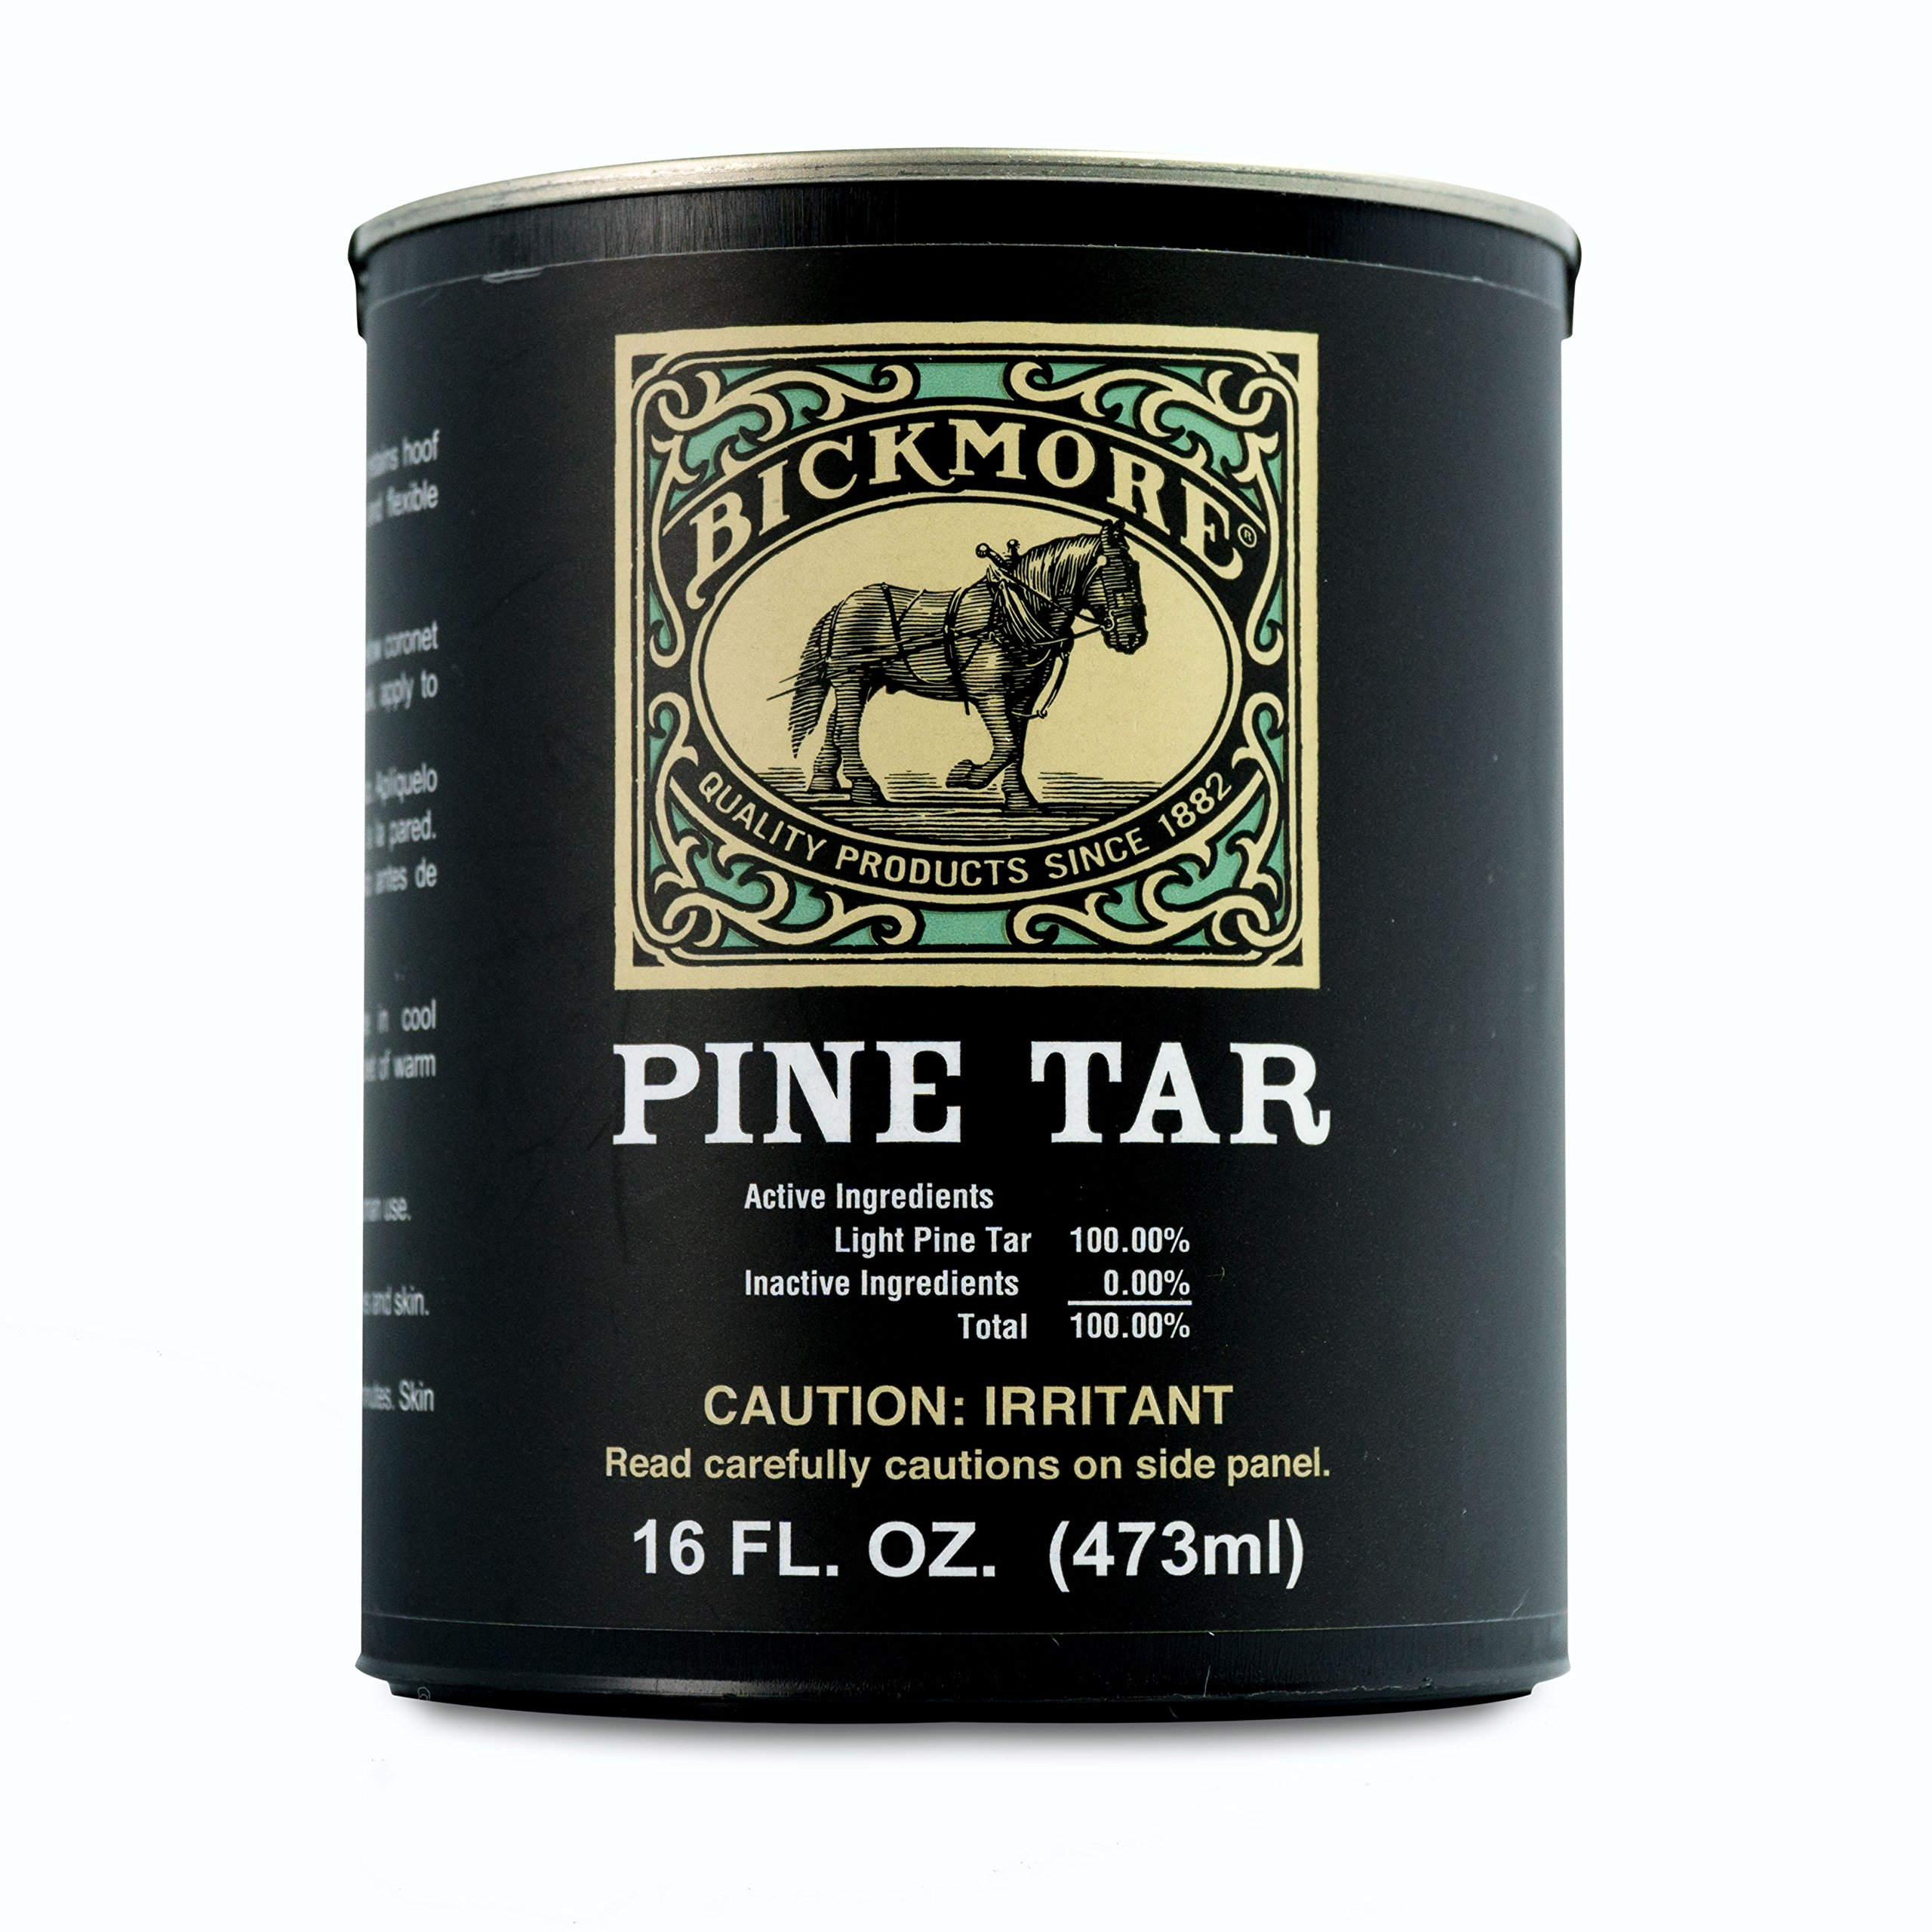 Bickmore Pine Tar 16oz - Hoof Care Formula For Horses